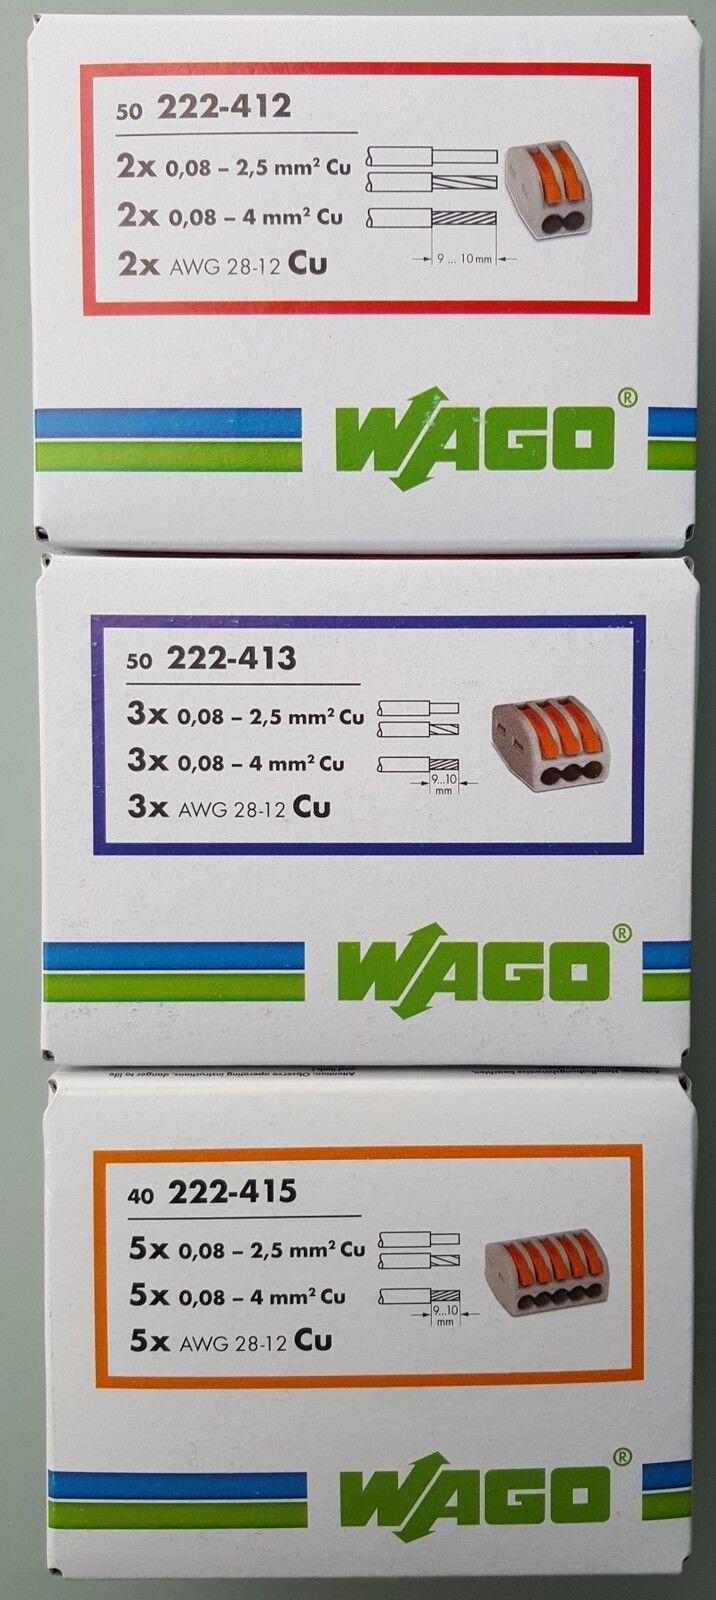 Wago Klemmen Set 2-3-5 pol 222(412-413-415) Verbindungsklemme Hebelklemme Klemme